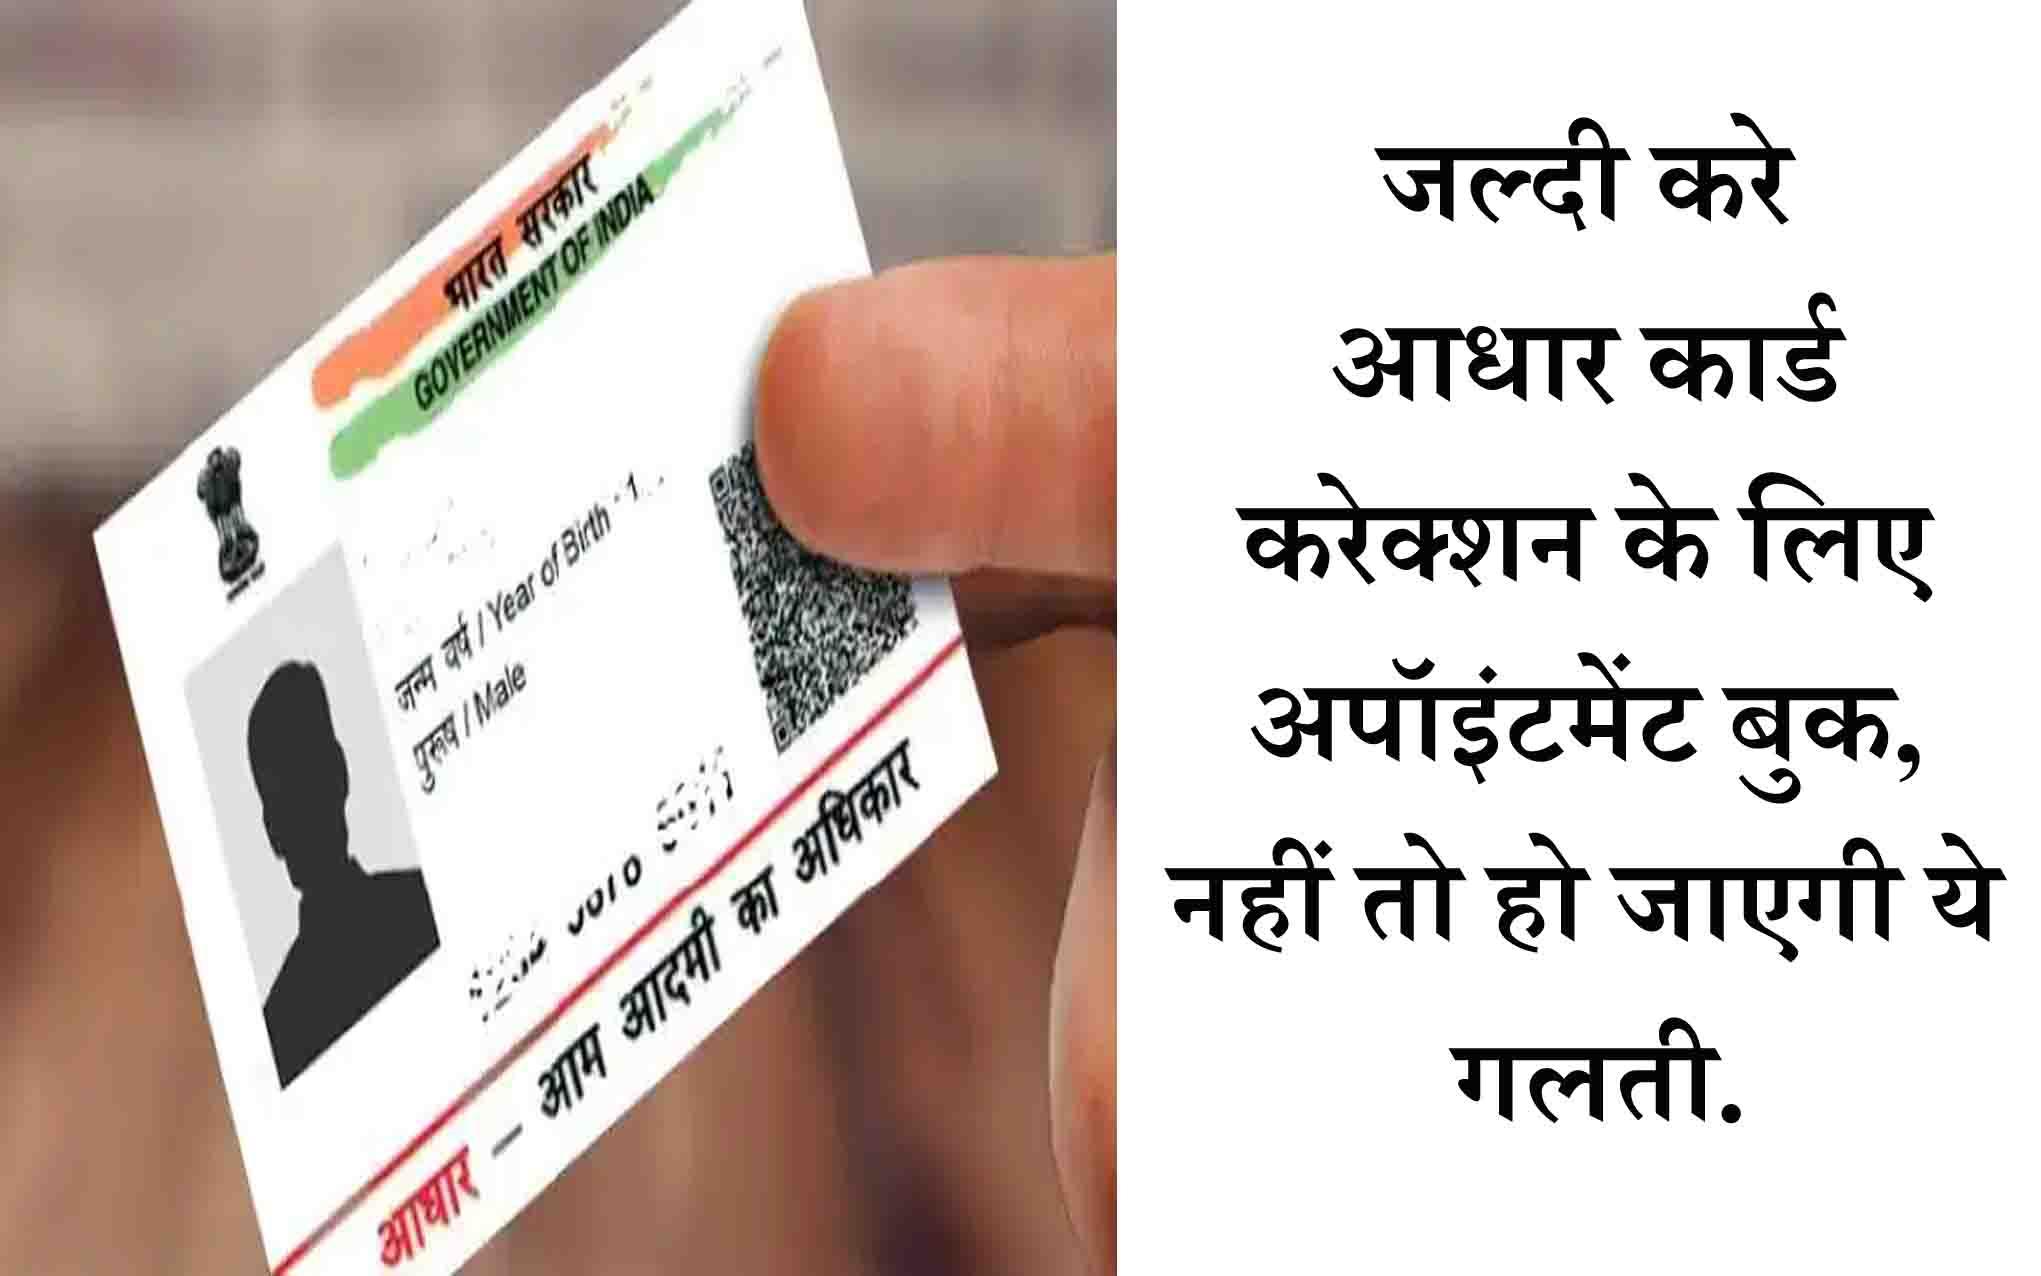 aadhar card correction ke liye appointment book kaise kare